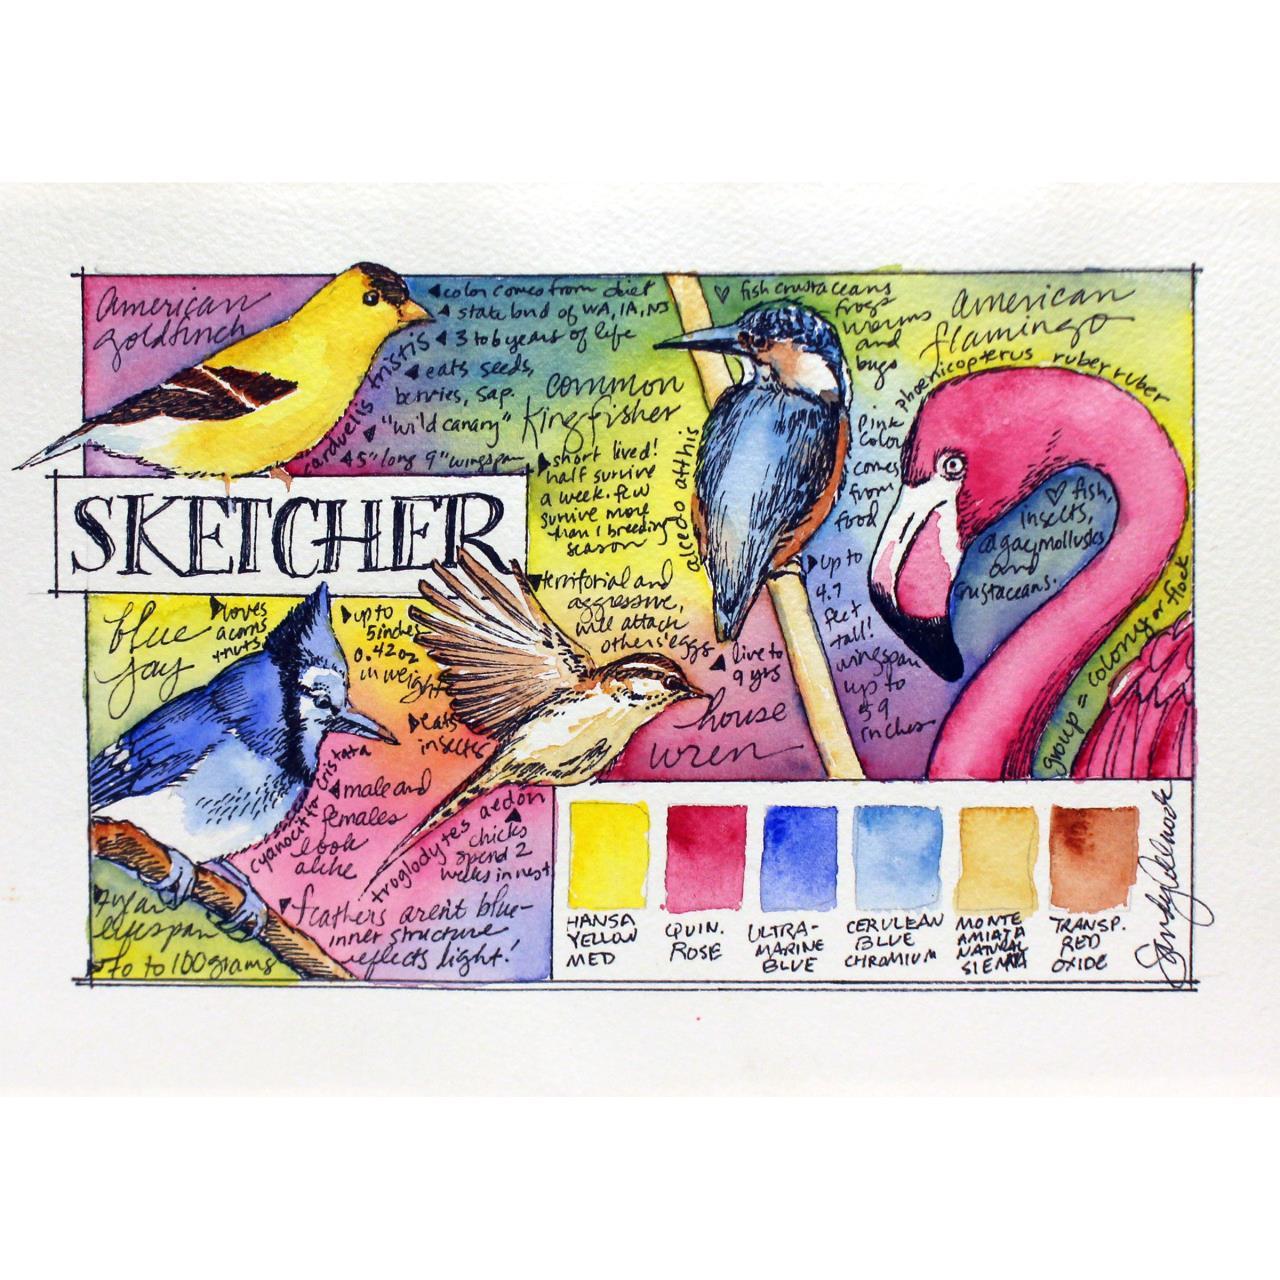 Sketcher, DANIEL SMITH Extra Fine Watercolors Half Pan Set - 743162034062